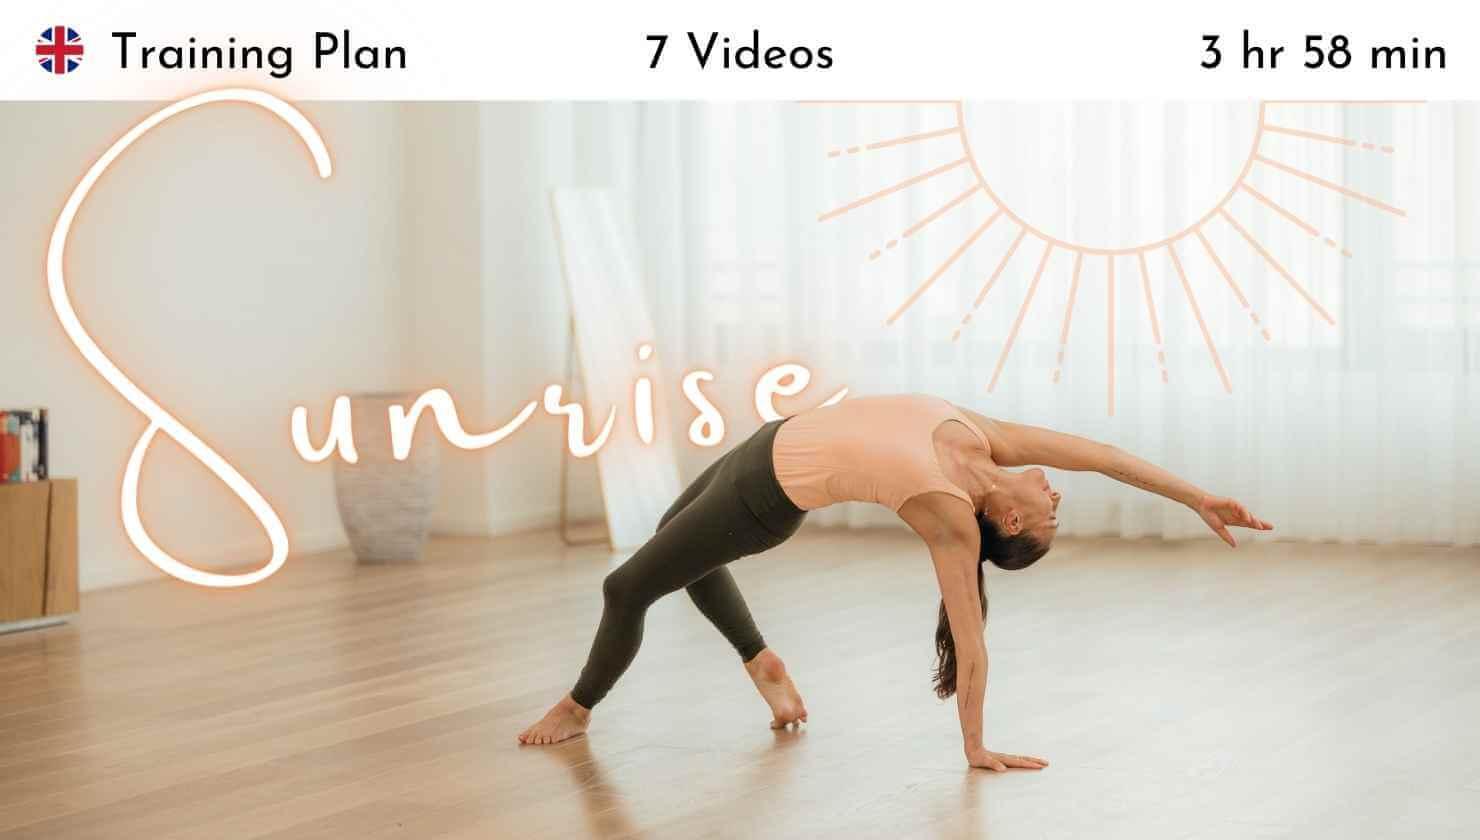 Thumbnails - Sunrise - Barbra Noh